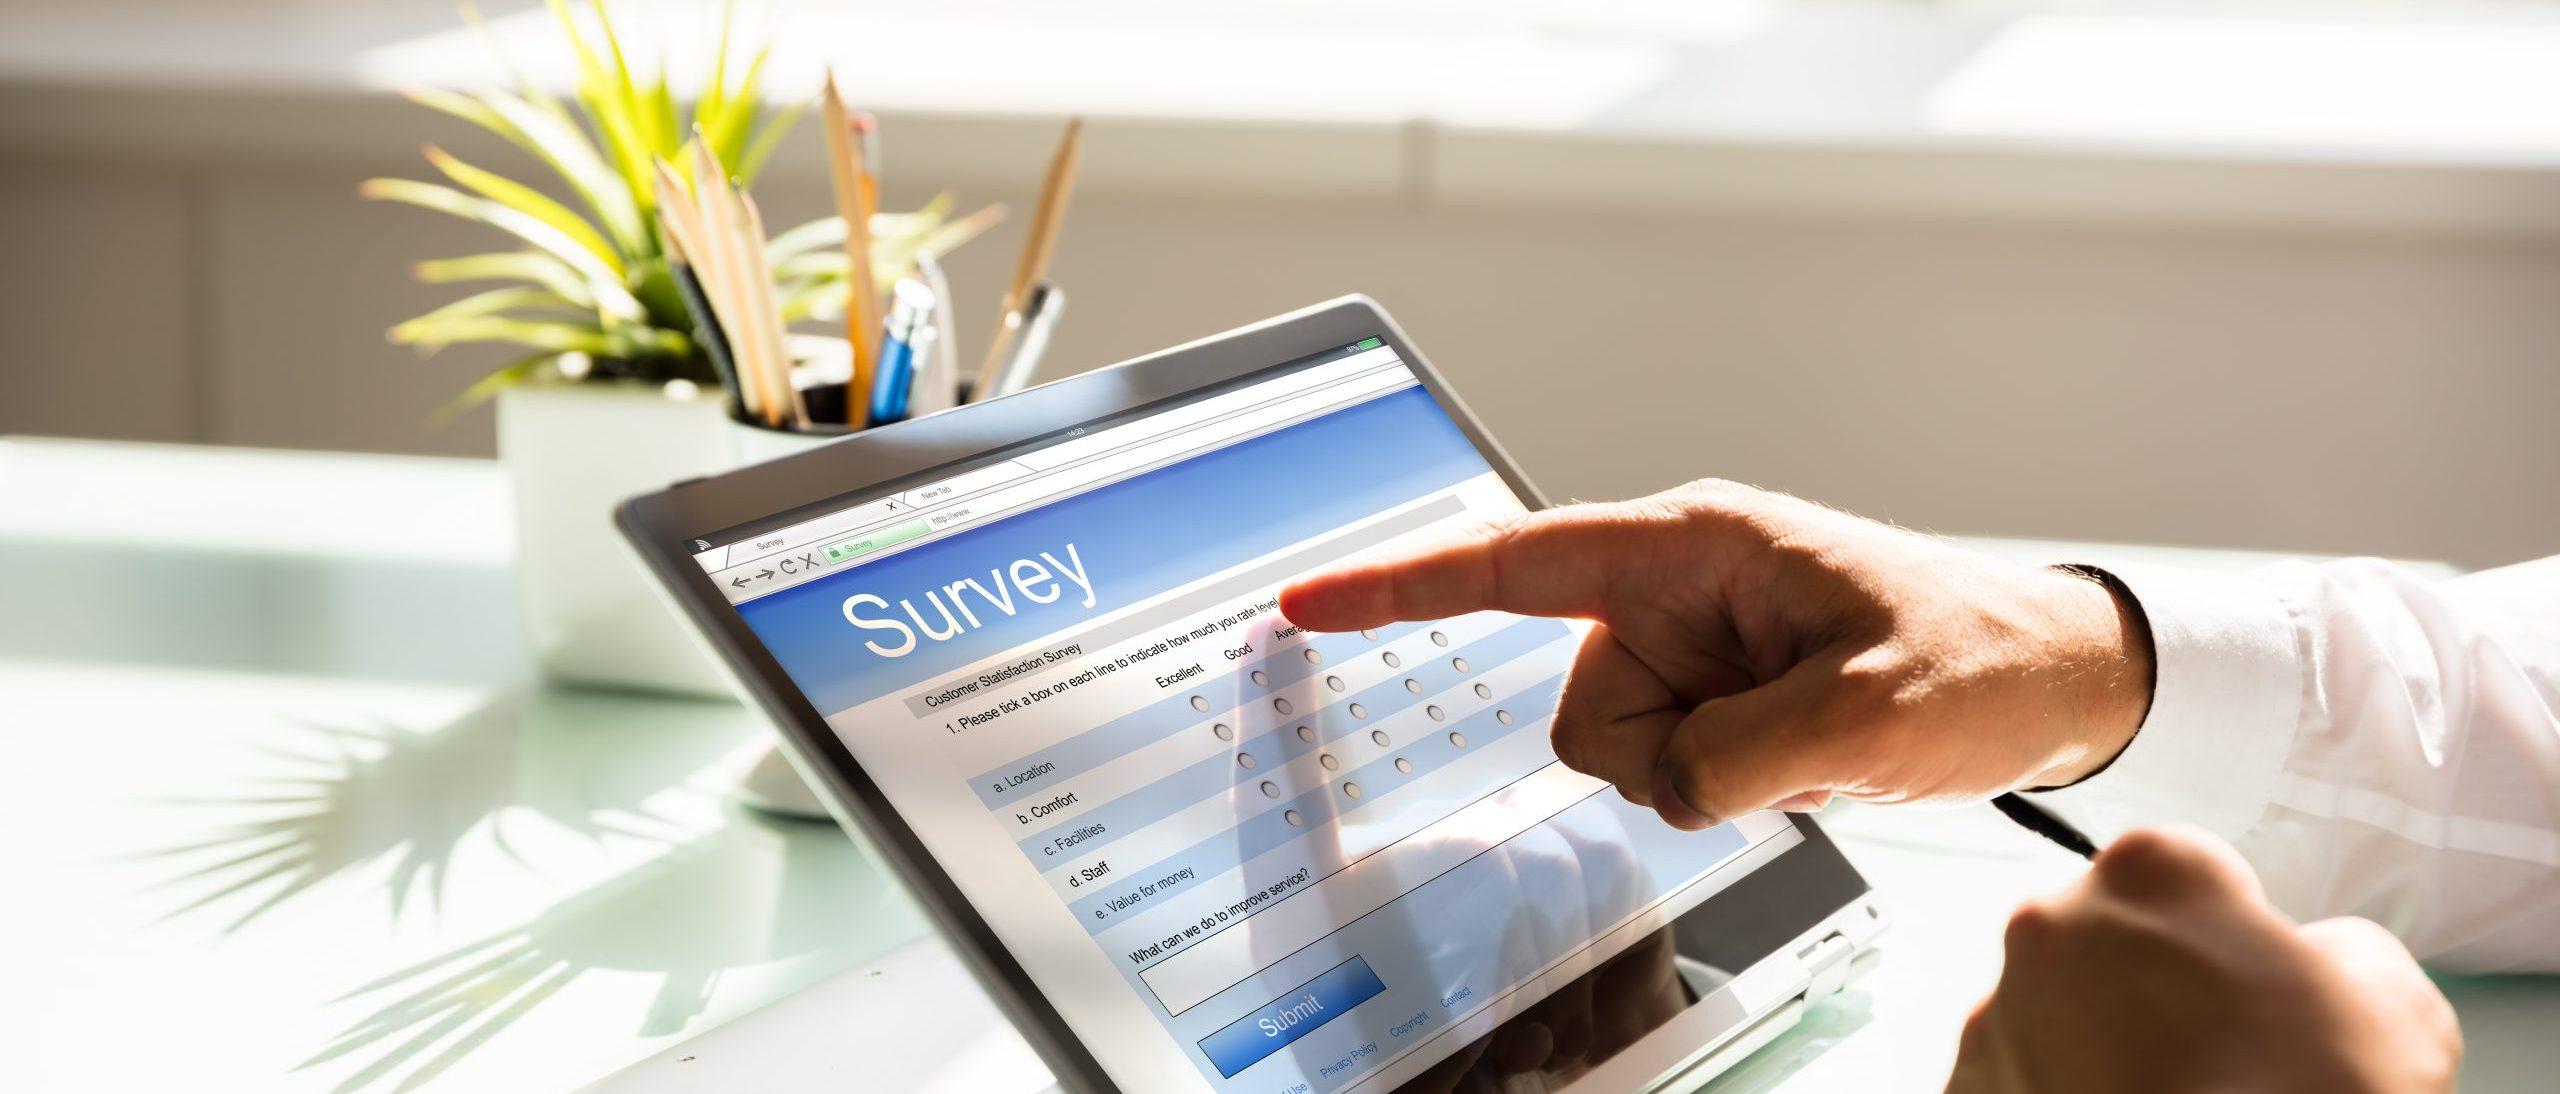 5 Key Success Factors to Creating an Effective Survey